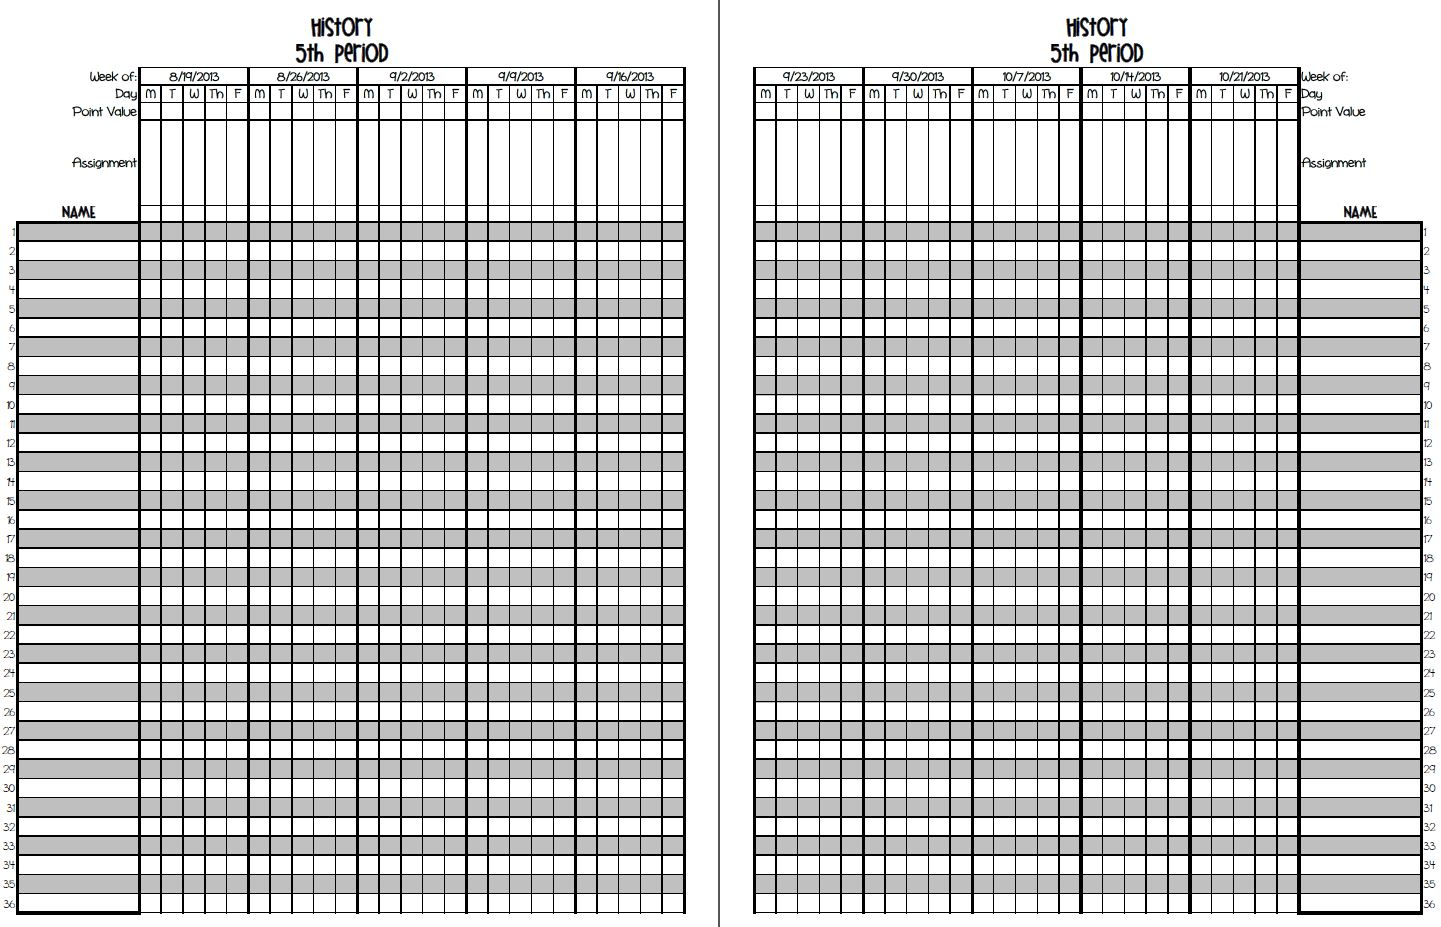 image regarding Printable Gradebook Template Word known as Excel Gradebook Template. halloween clip artwork additionally minion